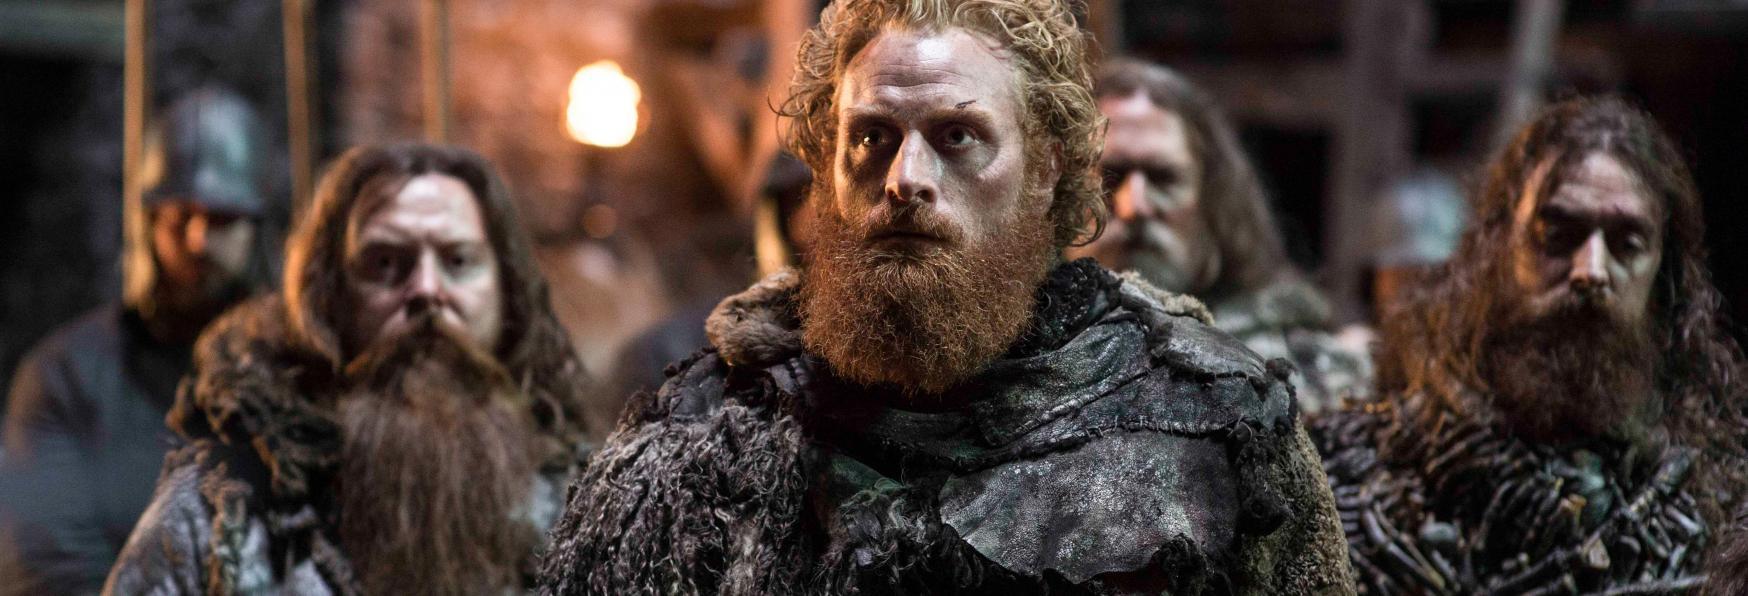 Kristofer Hivju (Tormund in Game of Thrones) è risultato Positivo al Coronavirus